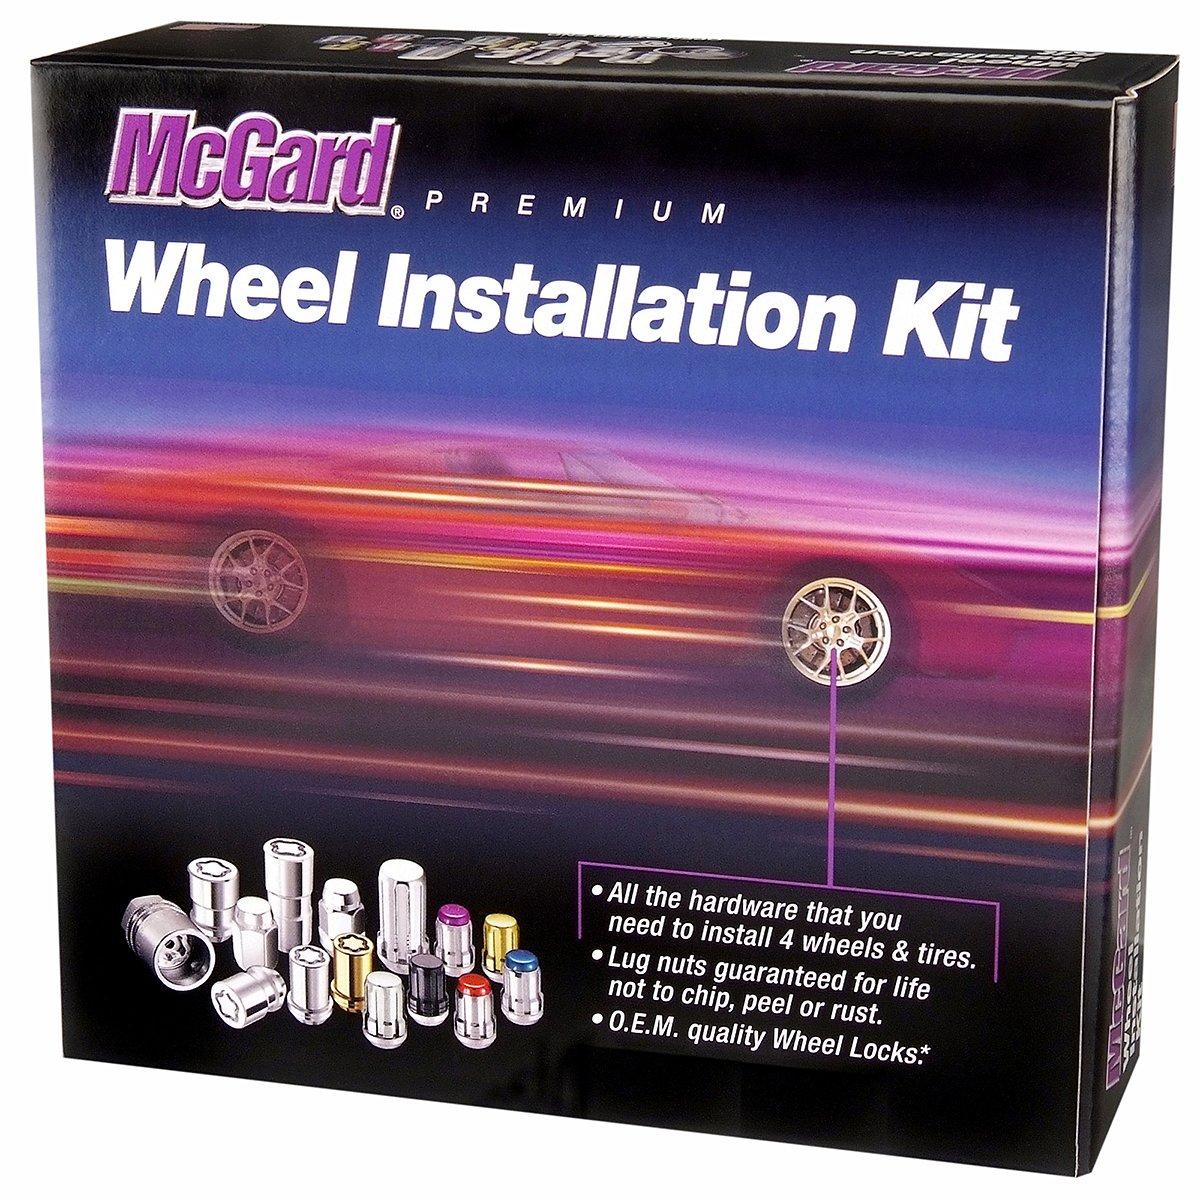 McGard 65810BK SplineDrive Chrome/Black (M14 x 1.5 Thread Size) Wheel Installation Kit for 8-Lug Wheels